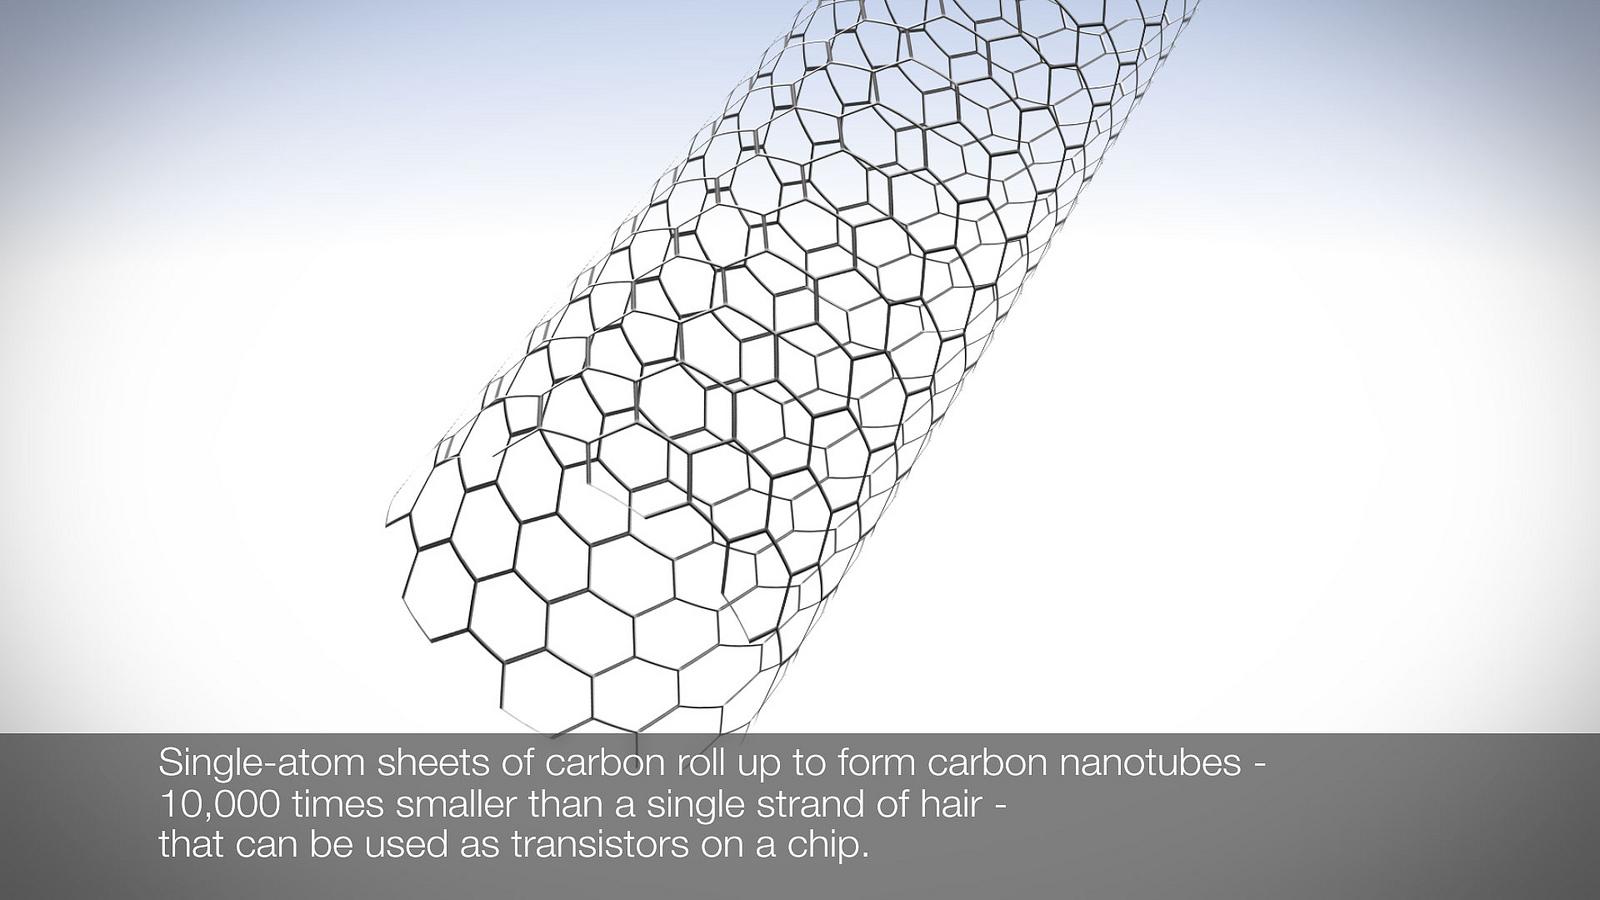 IBM Carbon Nanotubes